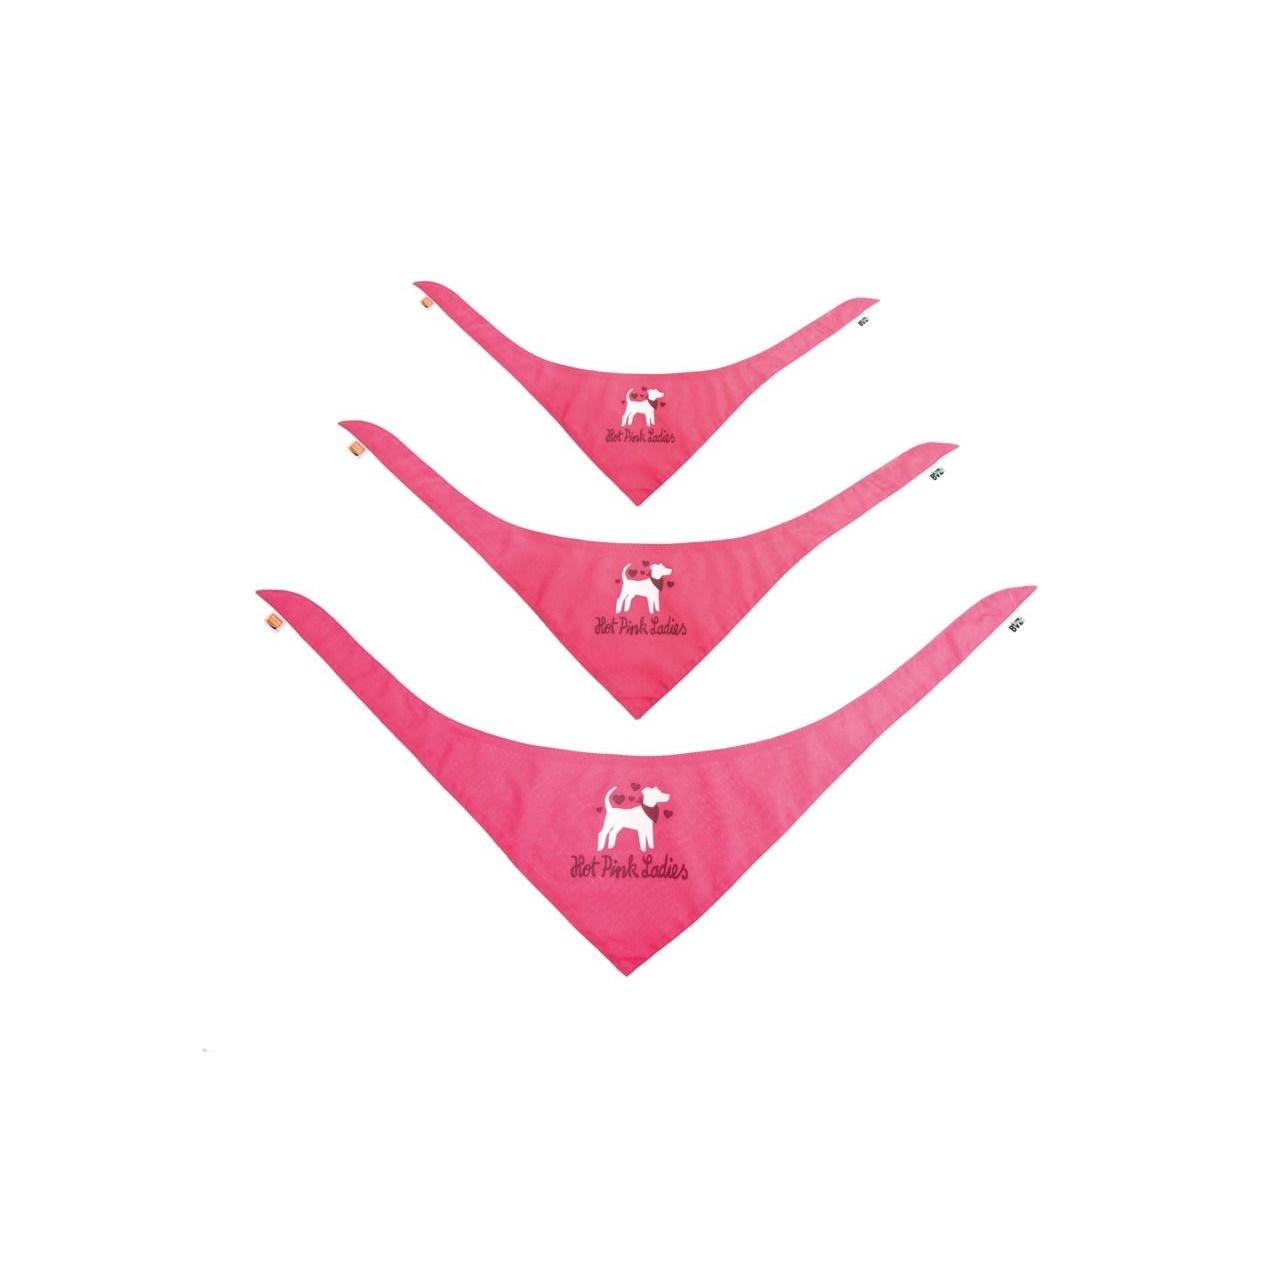 Karlie Hunde Halstuch Hot Pink Ladys, Bild 2